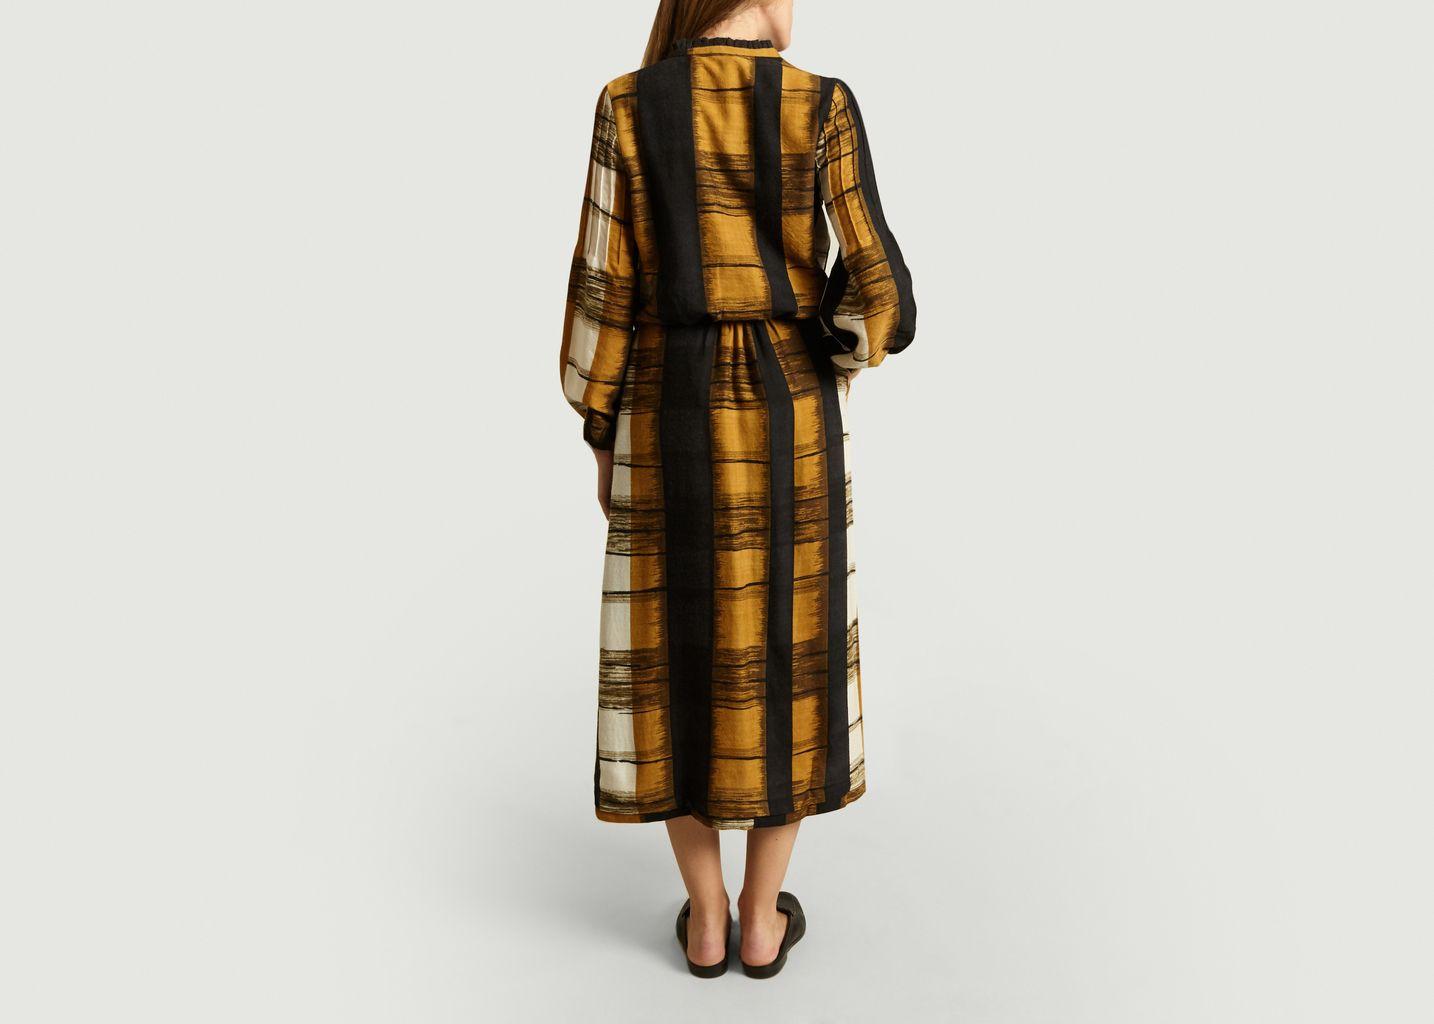 Robe Boutonnée Laine - Diega